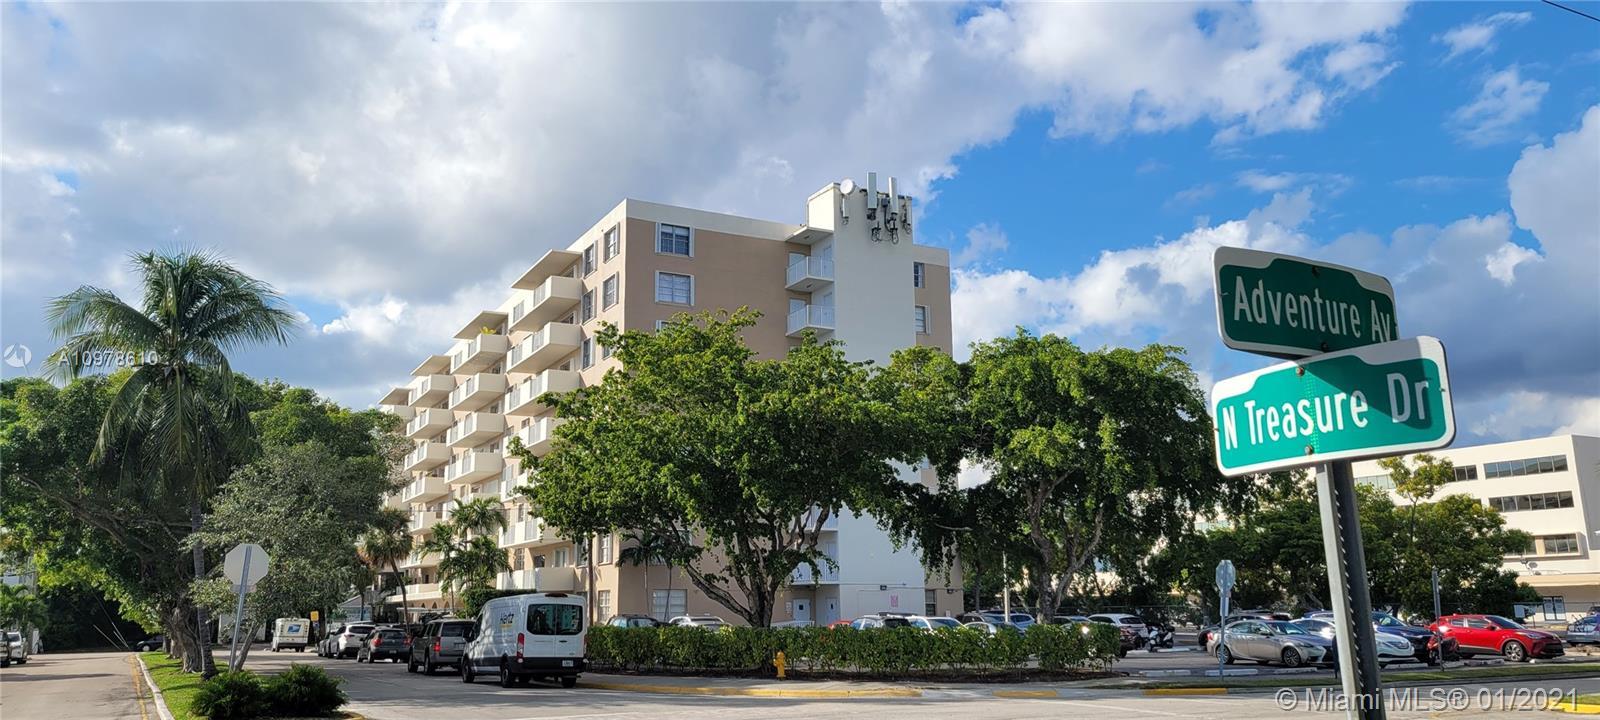 Island Place, 1455 N Treasure Dr Unit 6 A, North Bay Village, Florida 33141